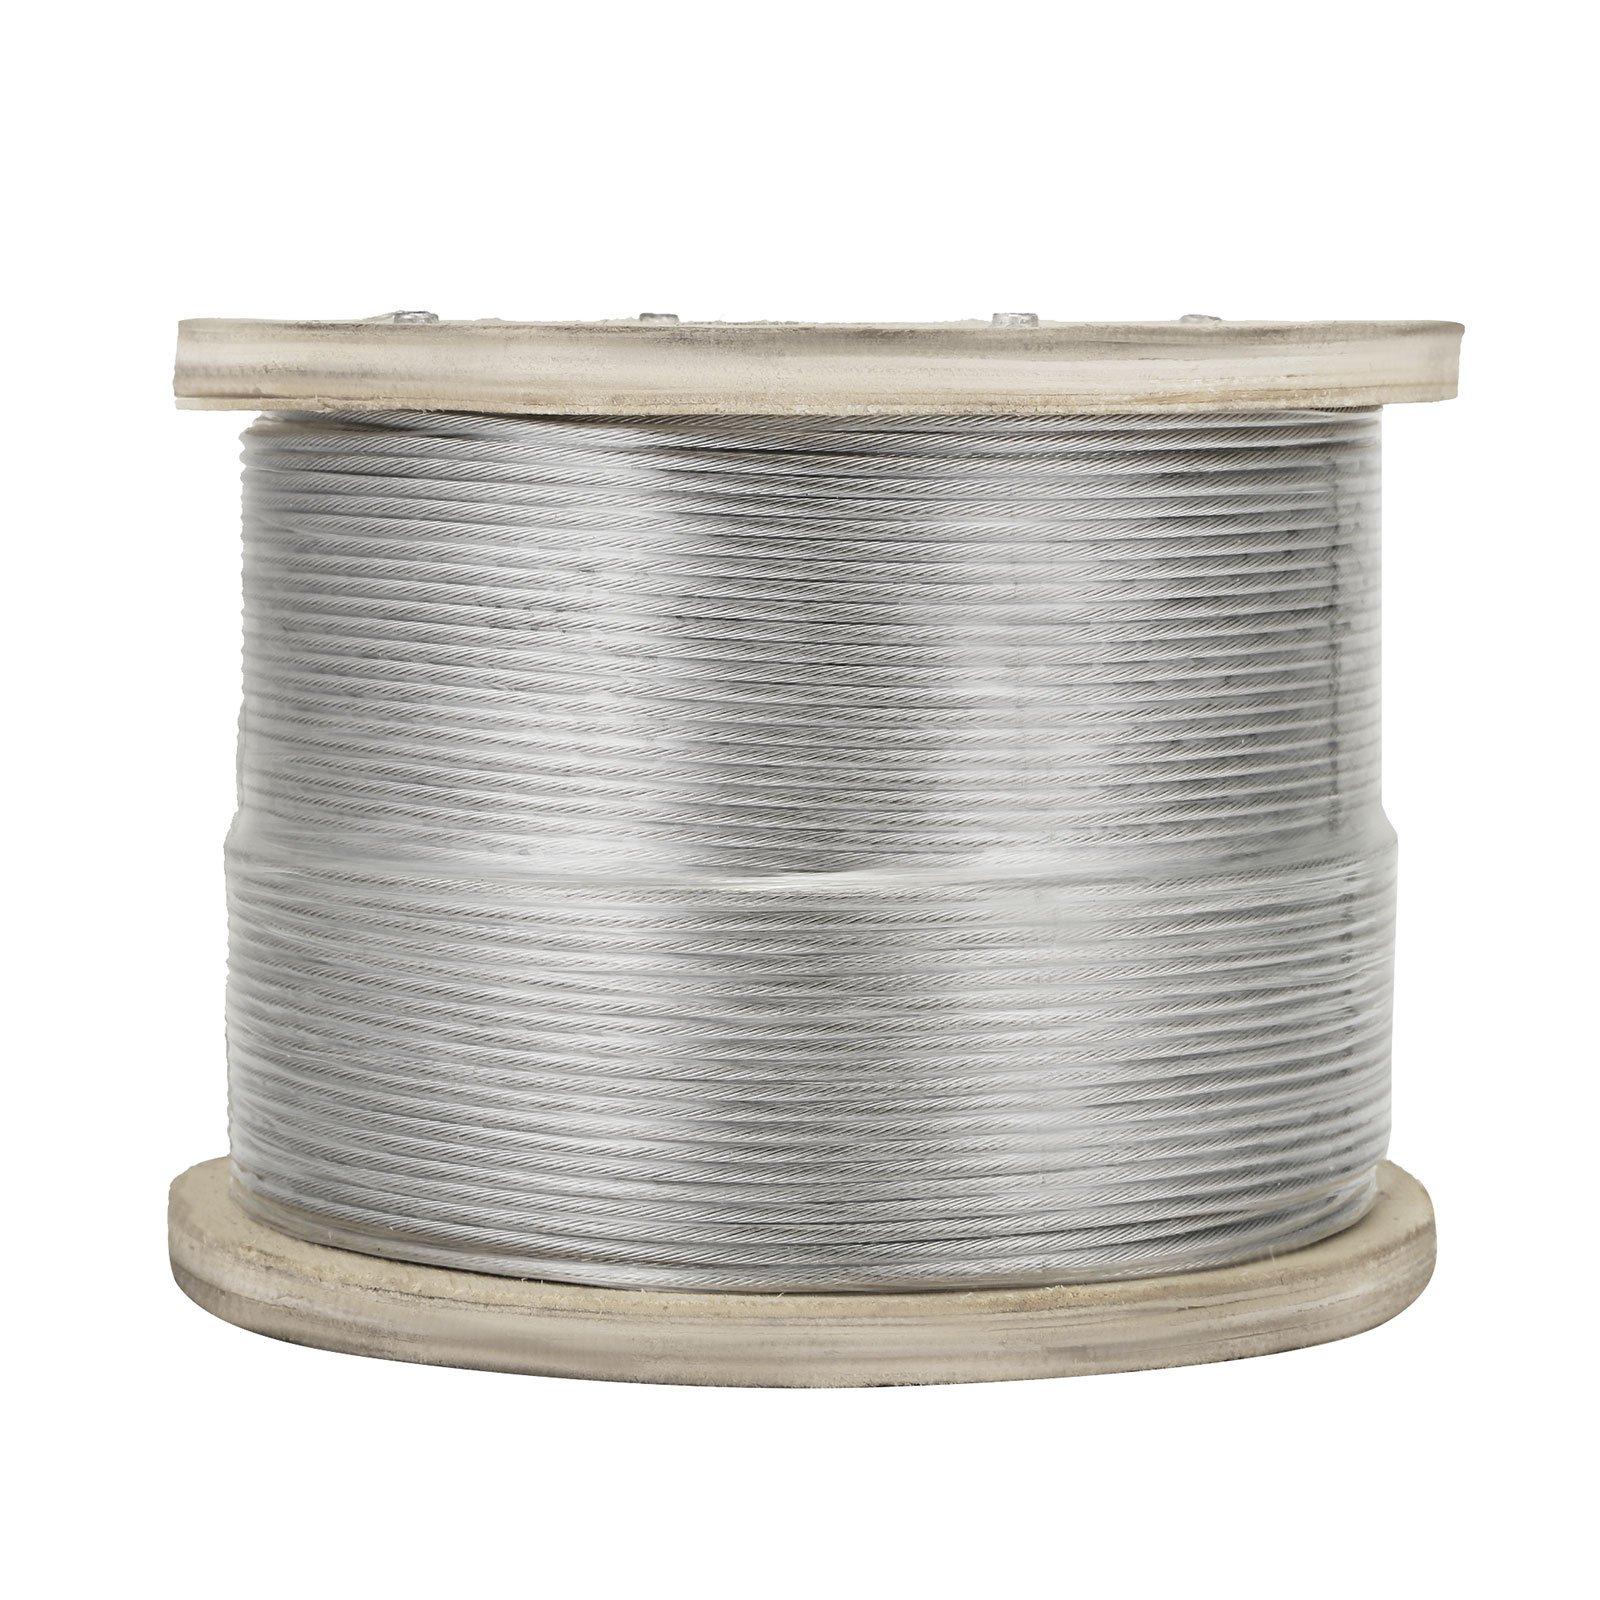 Cheap 1 8mm Stranded Steel Wire, find 1 8mm Stranded Steel Wire ...